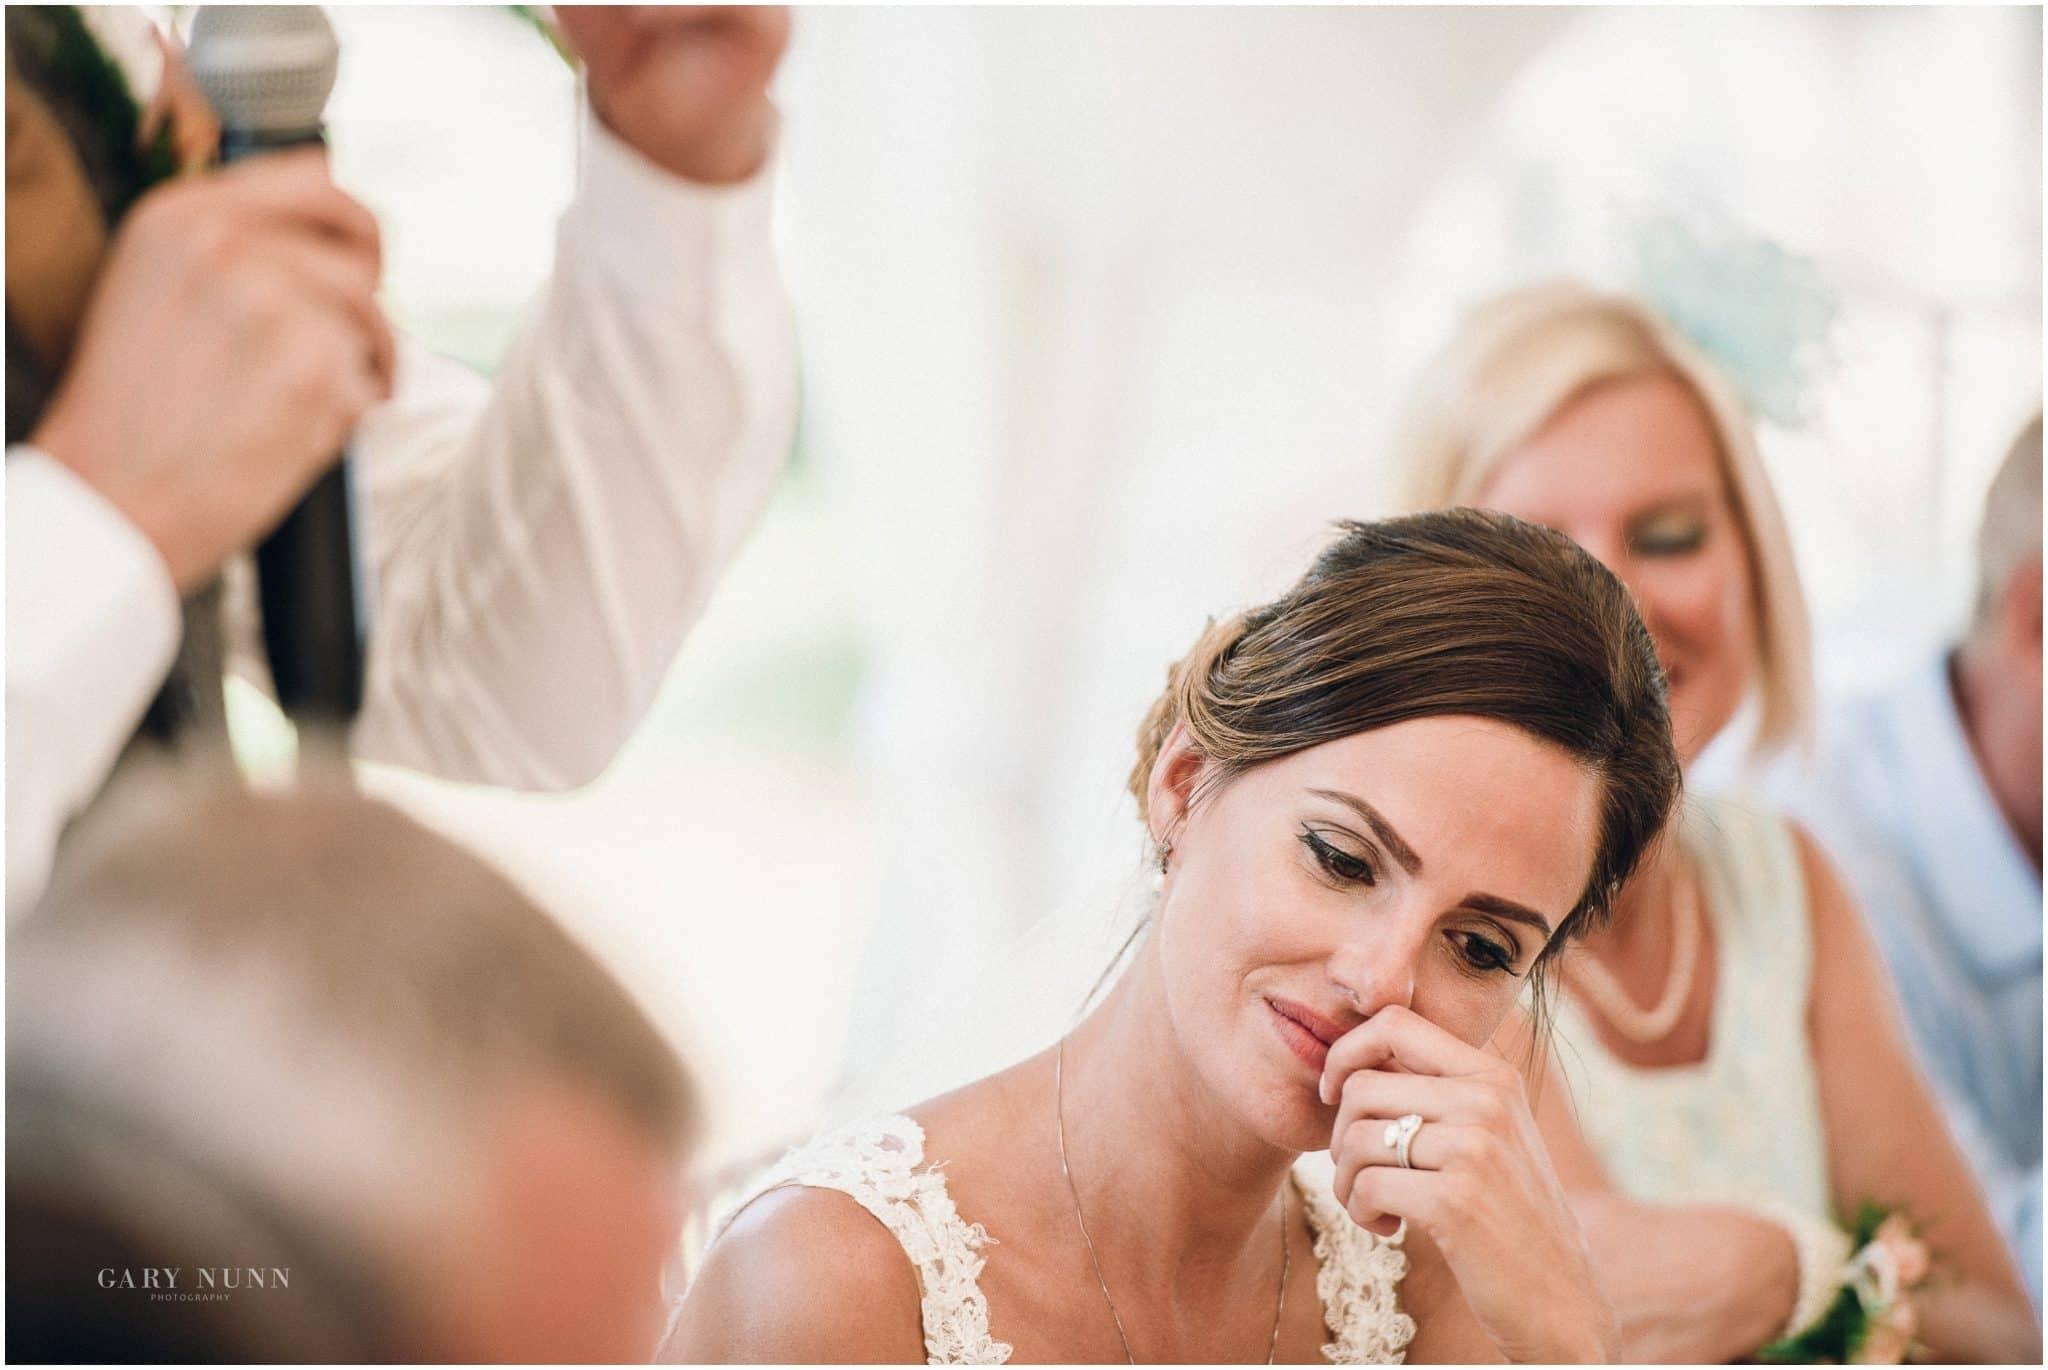 photographer milton keynes, Gary Nunn Photography, QUINTESSENTIAL BRITISH WEDDING, best wedding speeches